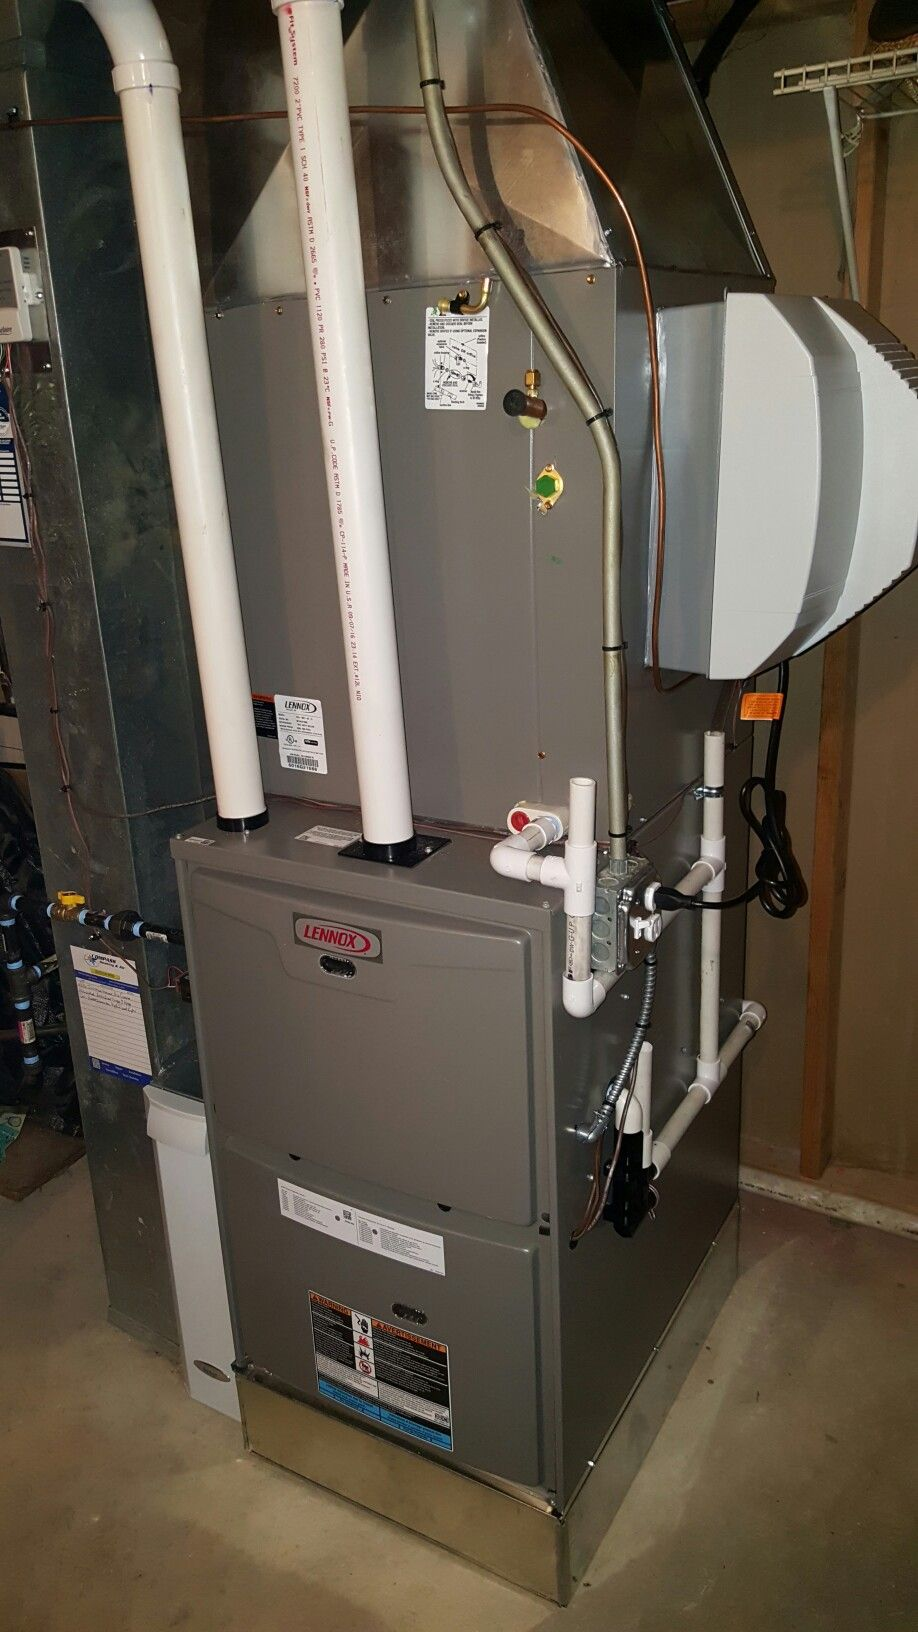 Lennox ML193 high efficiency furnace, cased evaporator